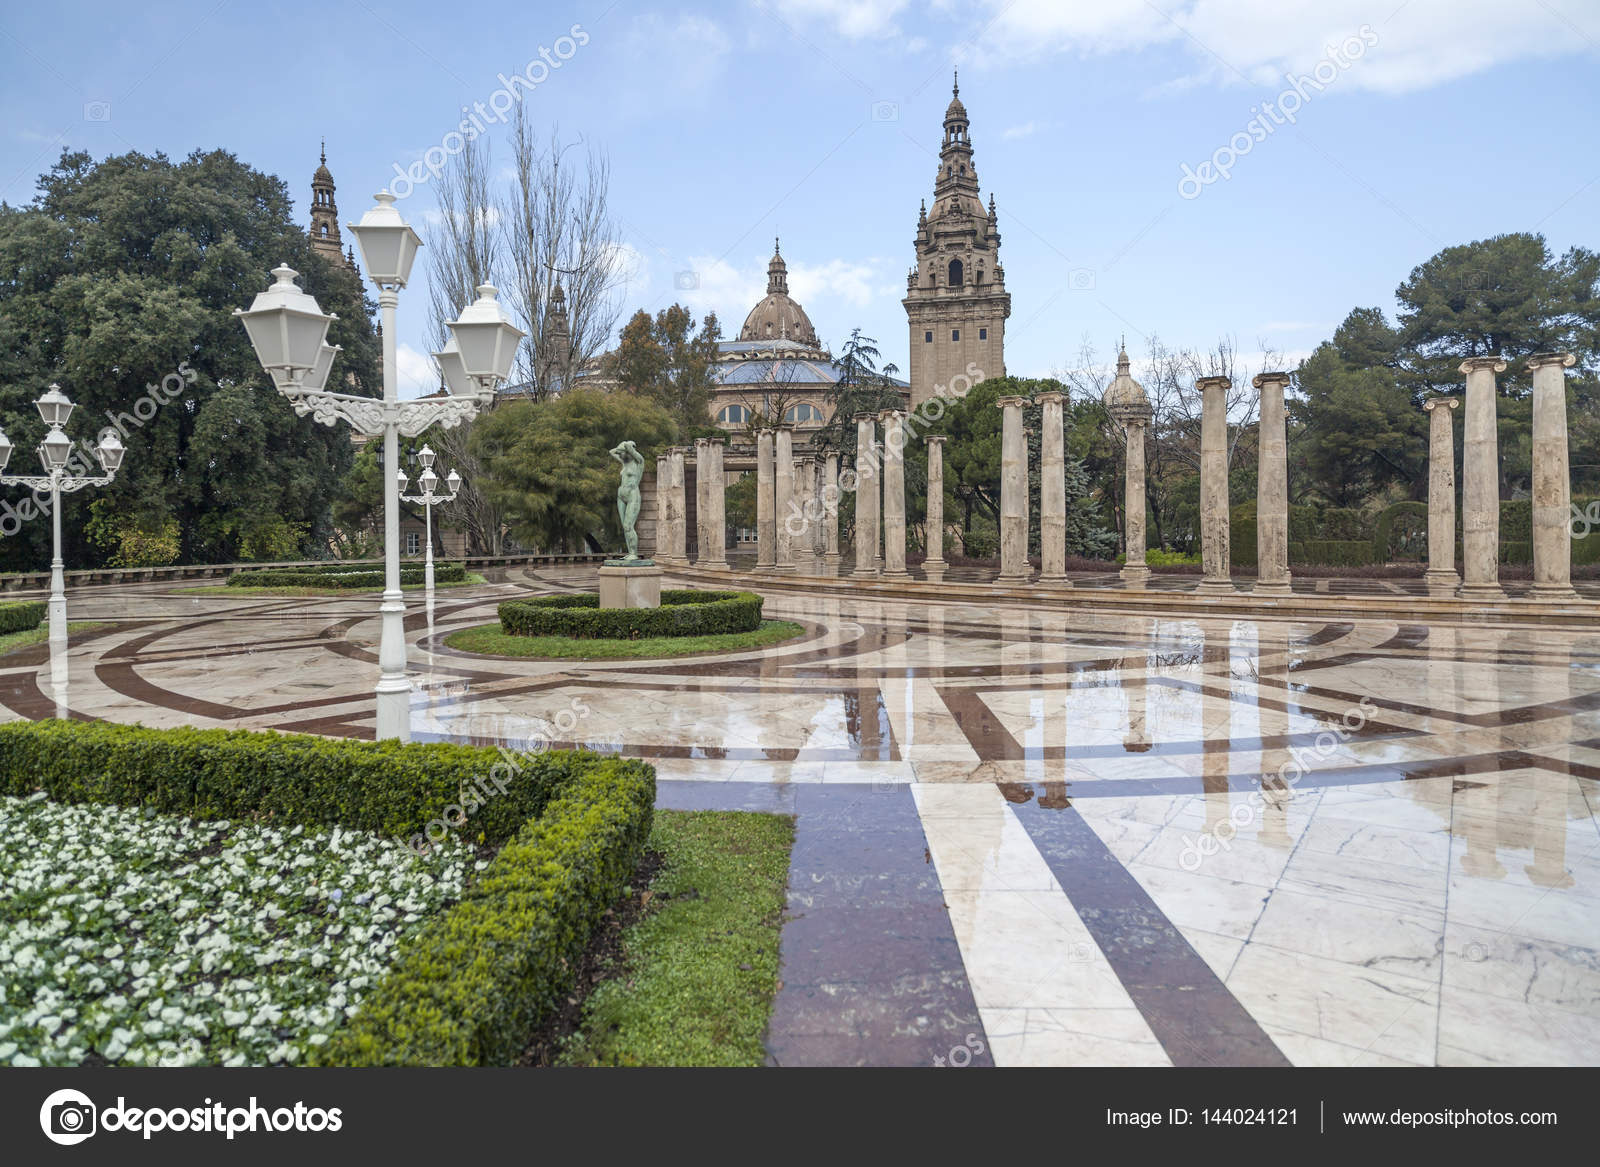 Fondo columna mar de barcelona jardines jardins joan maragall paseo con columnas j nicas - Jardines de montjuic ...